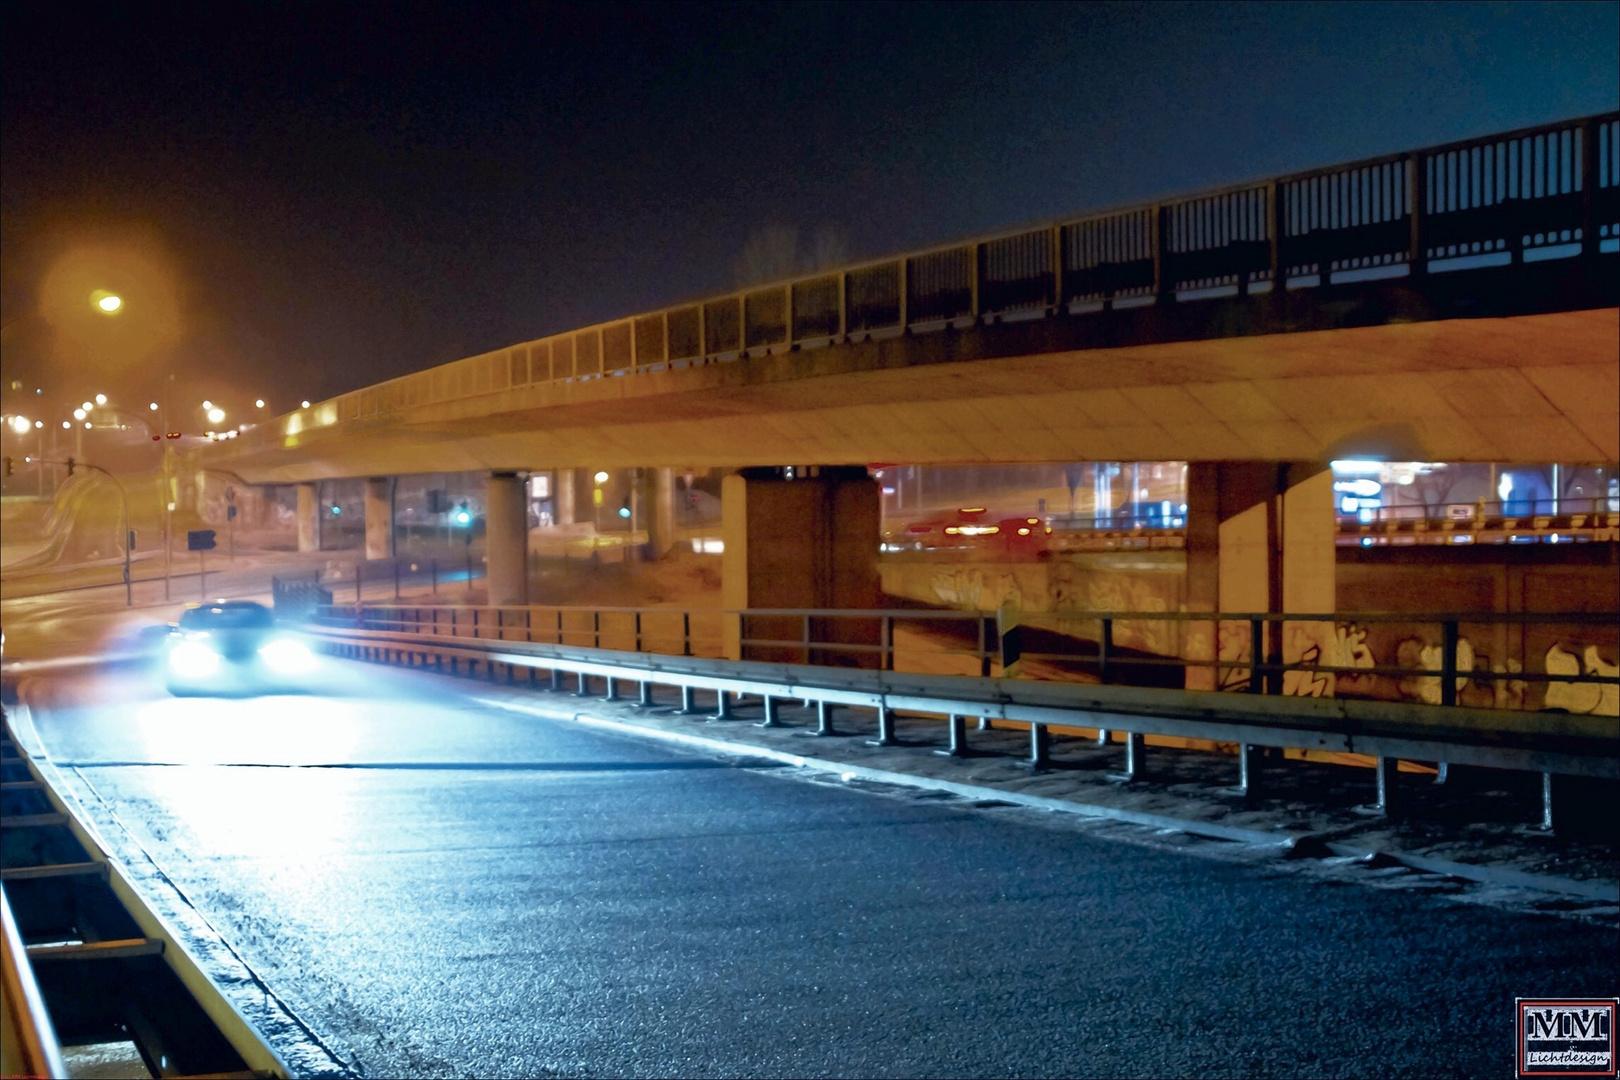 Brückensuffahrt